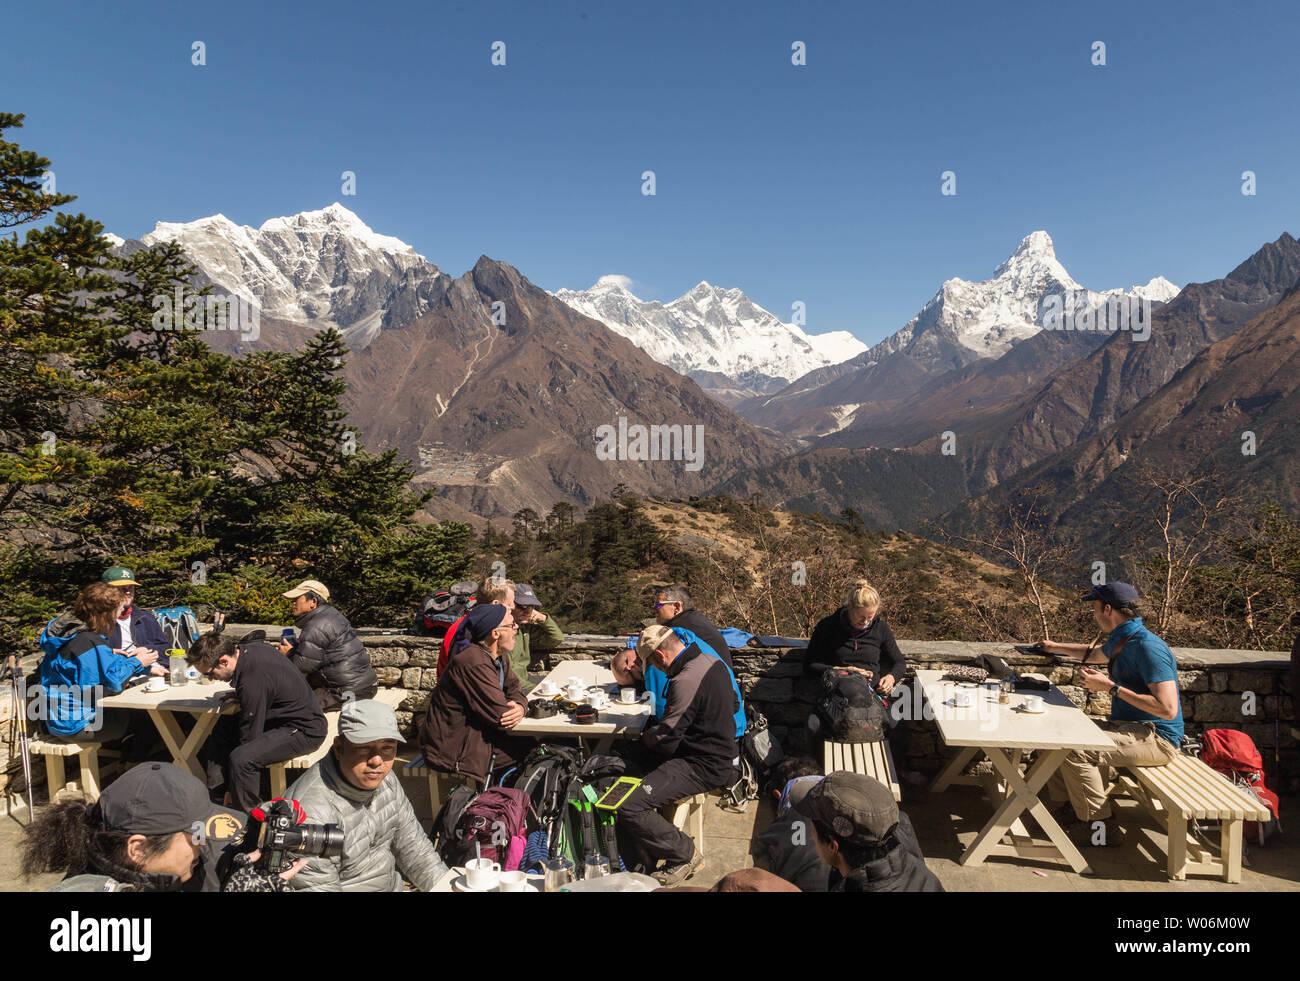 Hotel Everest view, Everest Base Camp Trek, Sagarmatha National Park, Nepal - Stock Image